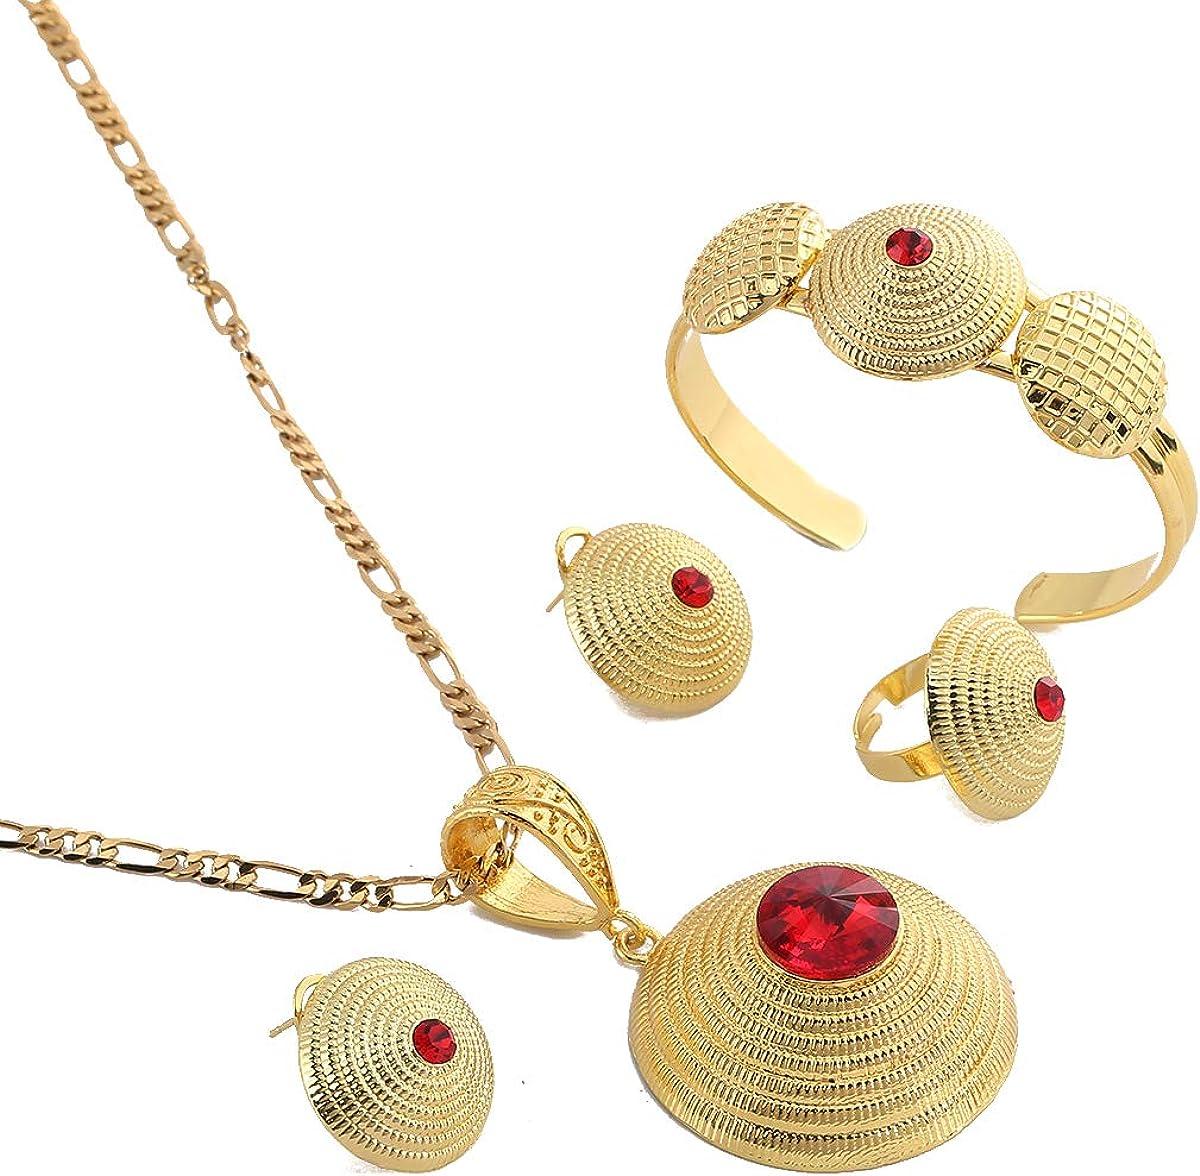 Ethiopian Jewelry Set Necklace Earrings Ring Bangle Pendant Eritrea Africa Habesha Wedding Jewelry